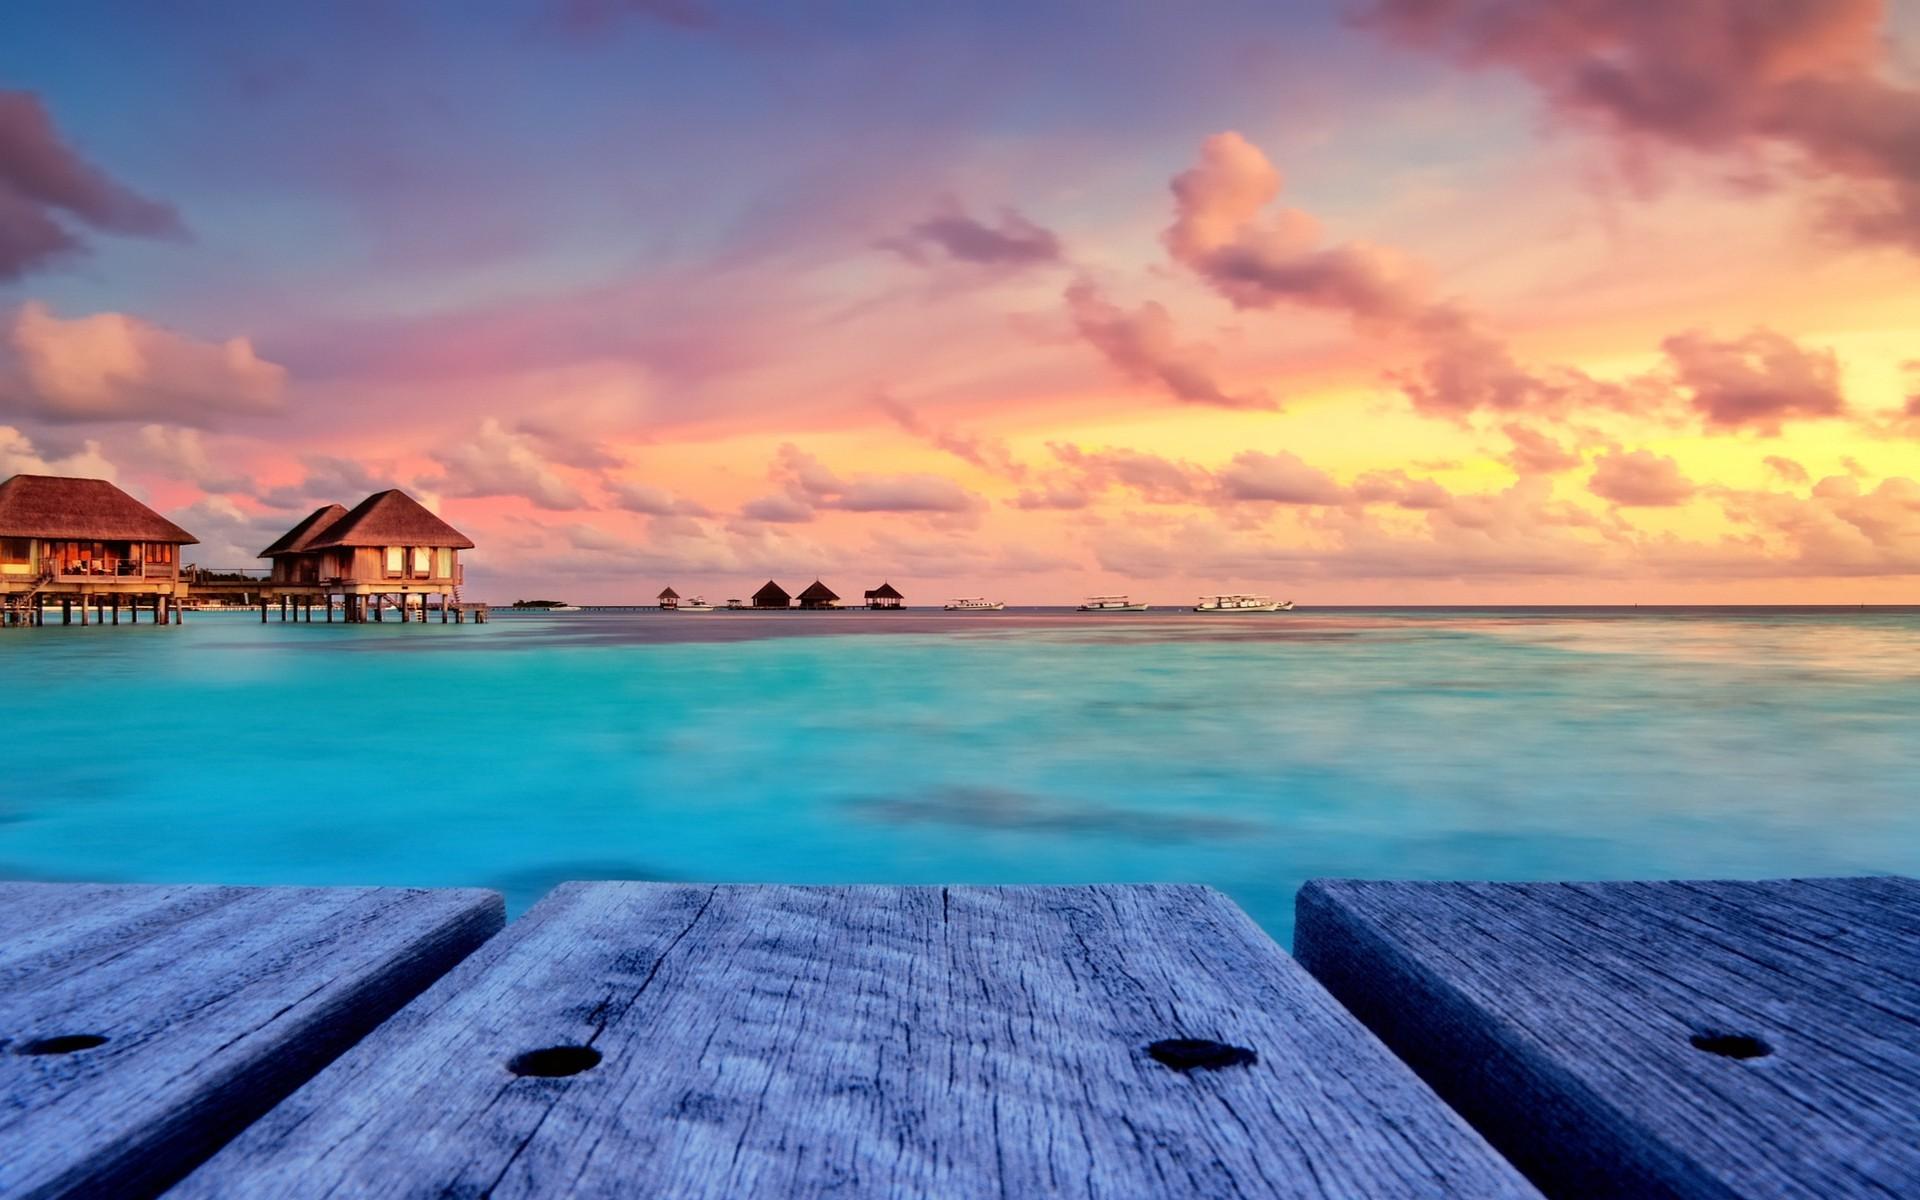 Hd Tropical Island Beach Paradise Wallpapers And Backgrounds: Tropical Island Sunset Wallpaper (58+ Images